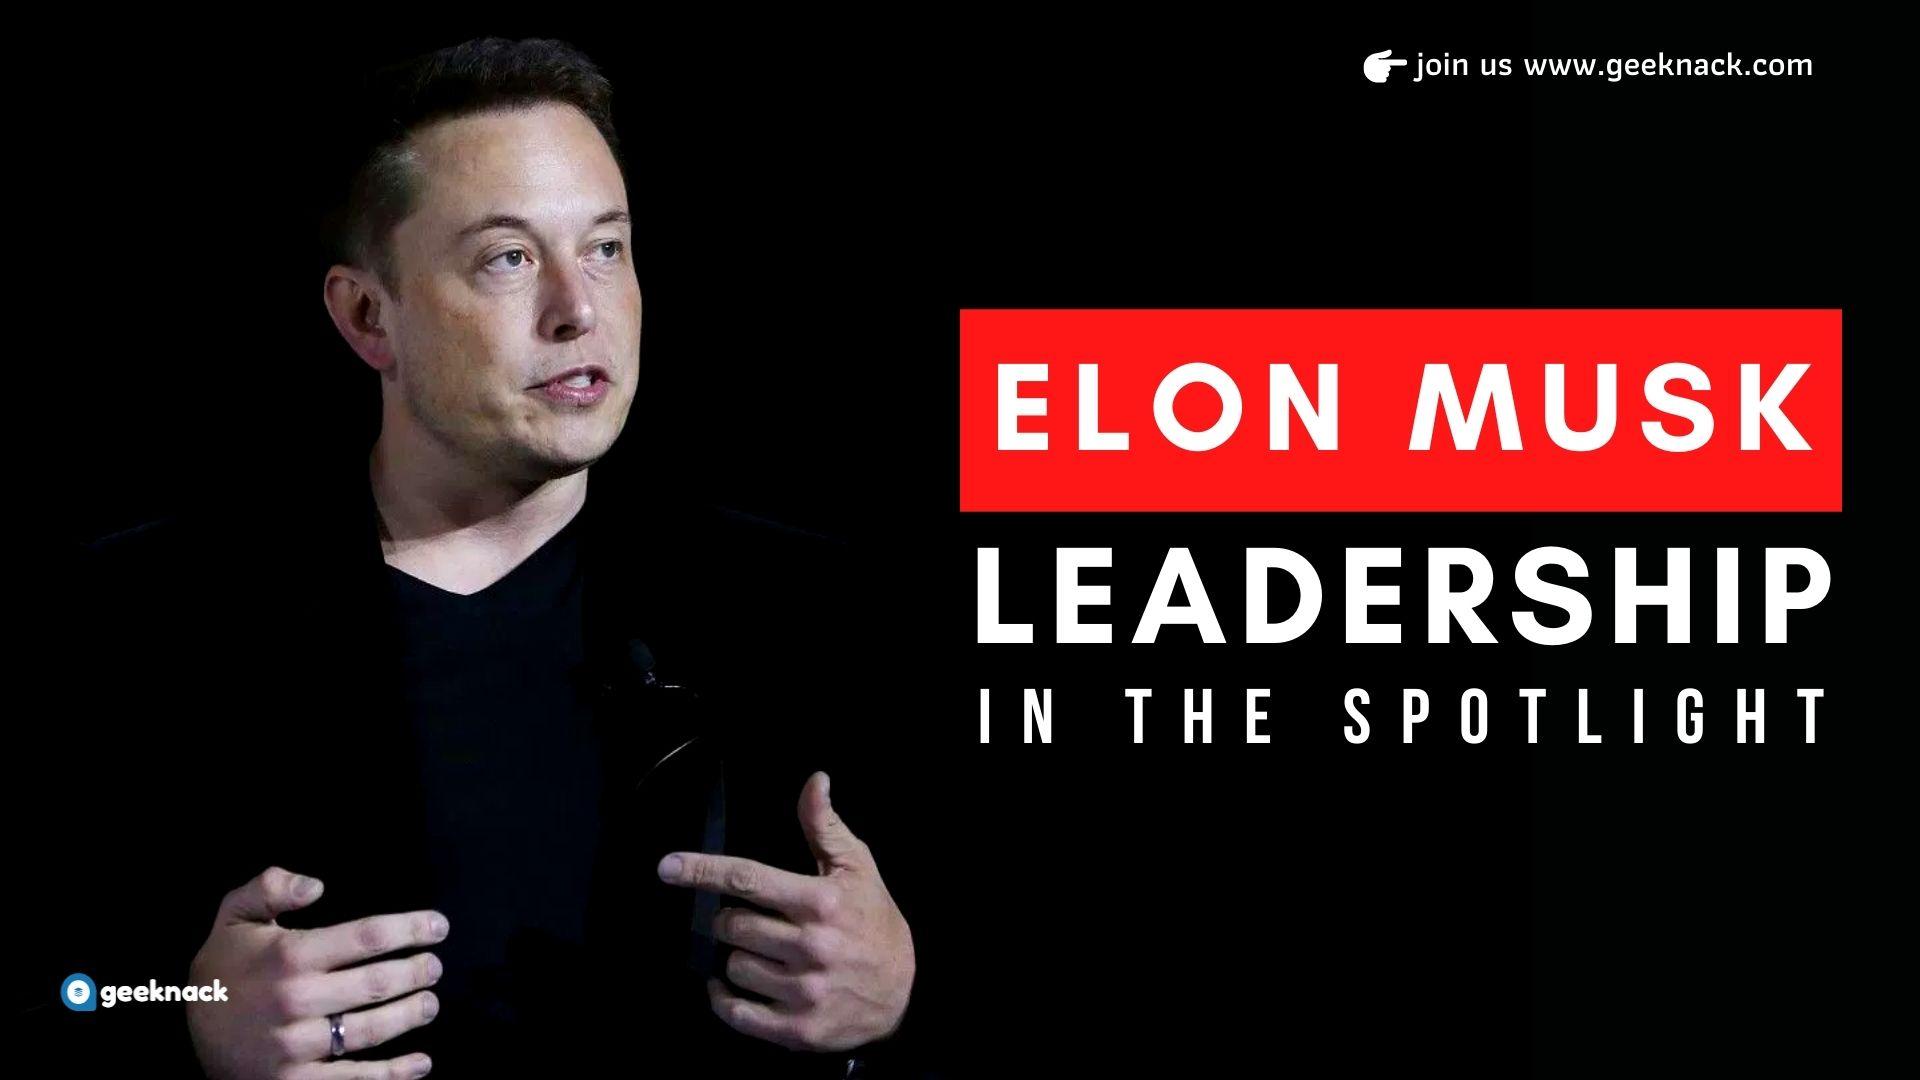 Elon Musk Leadership In The Spotlight cover